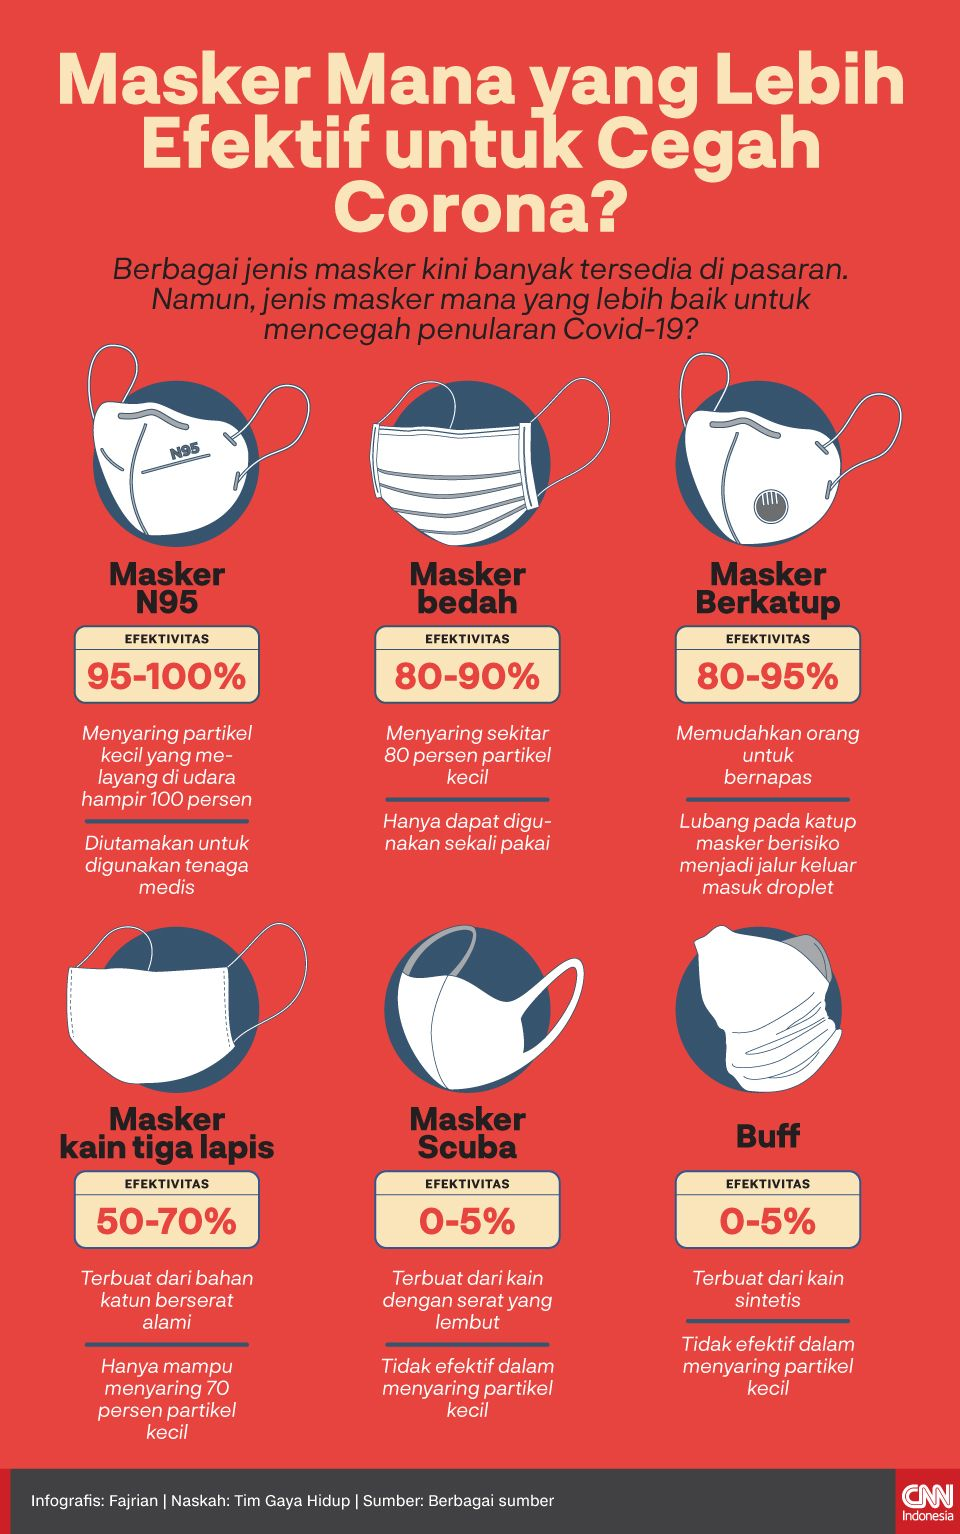 Infografis Jenis Masker Mana yang Lebih Efektif untuk Cegah Corona?